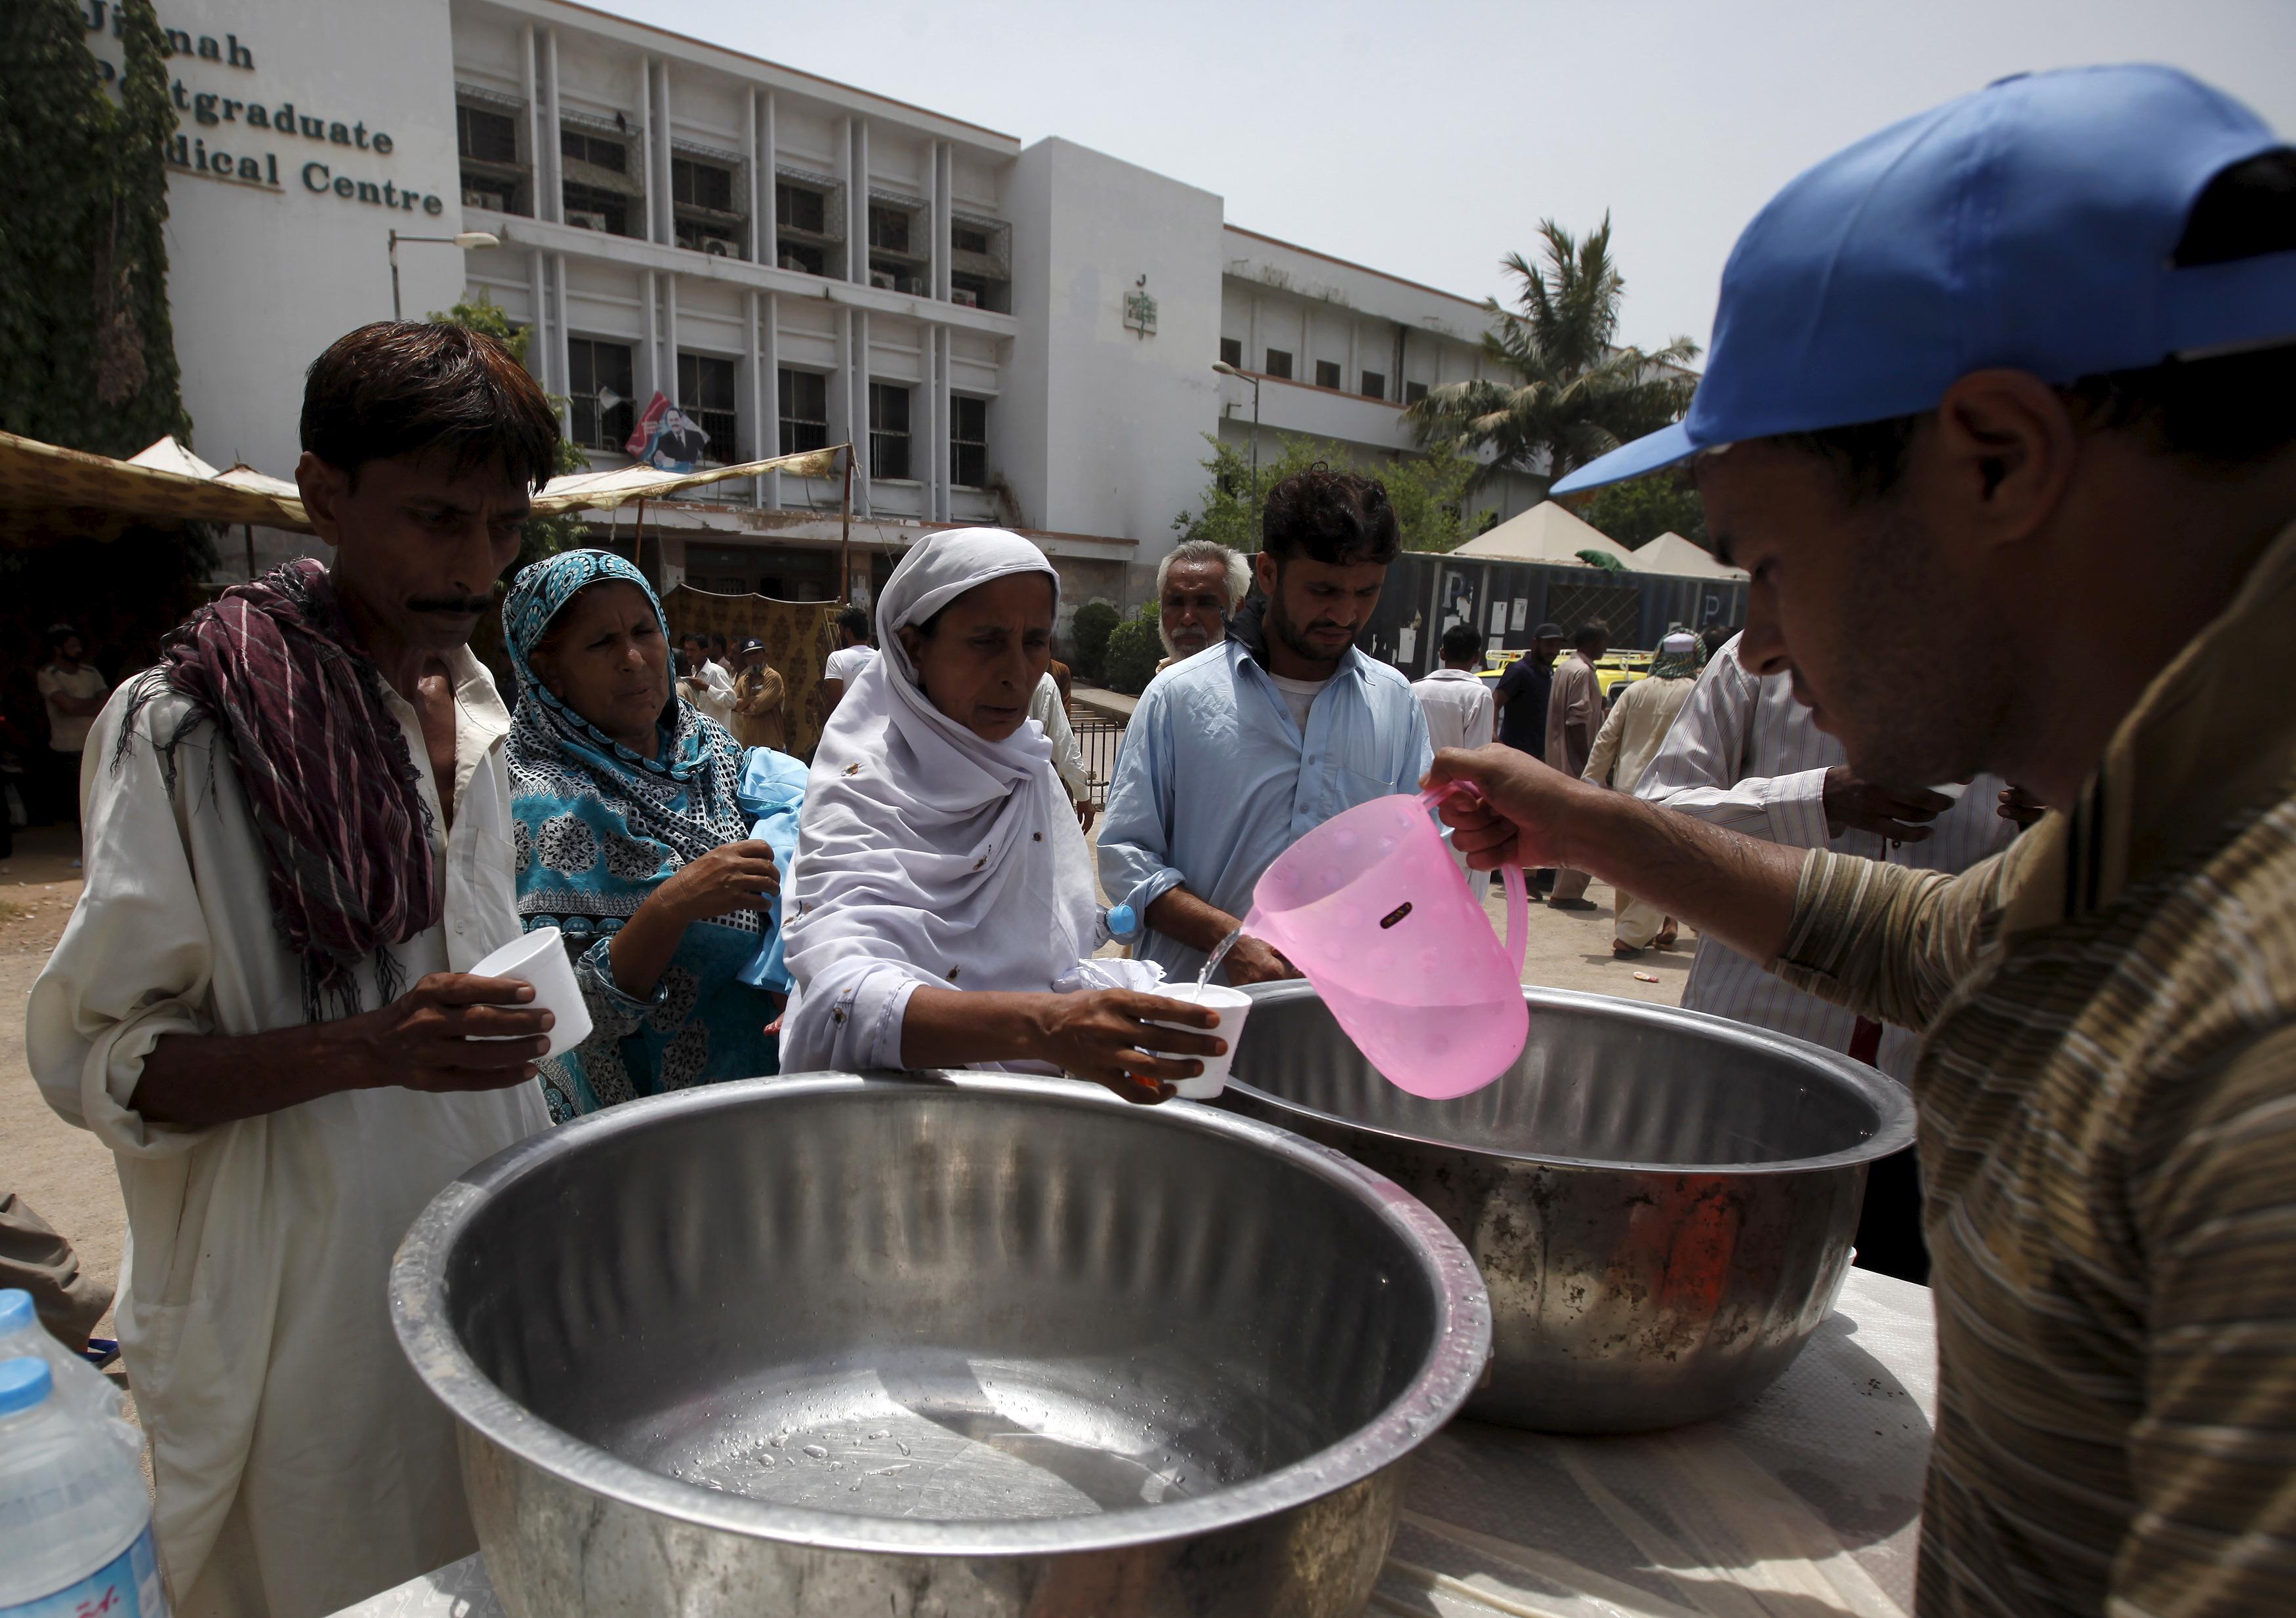 Volunteers hand out drinking water outside the Jinnah Postgraduate Medical Center in Karachi, Pakistan on June 23. Photo by Akhtar Soomro/Reuters